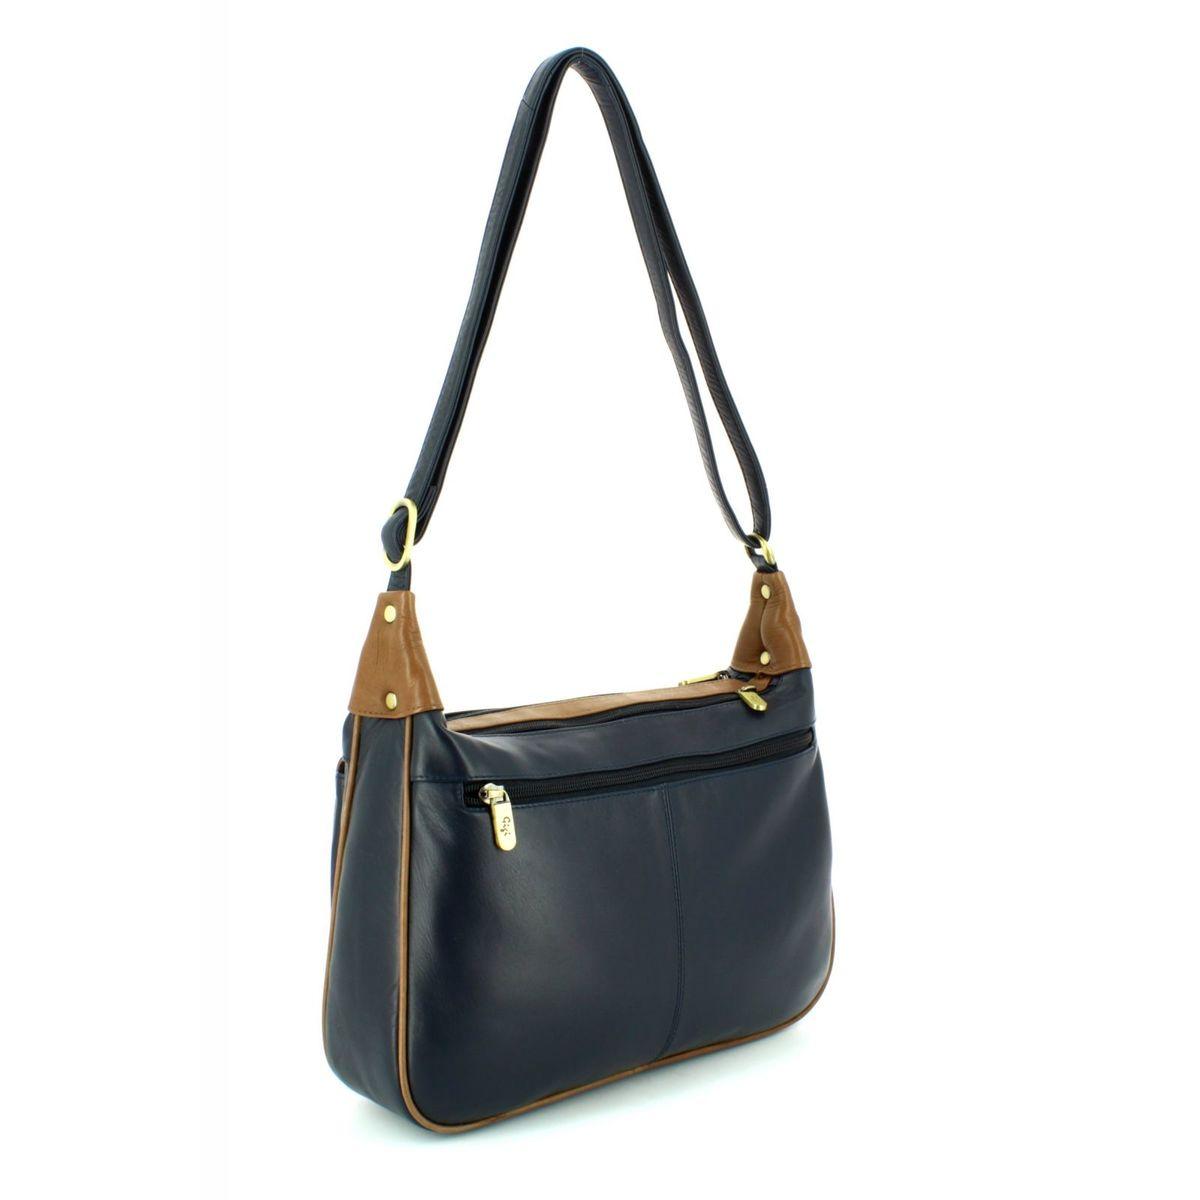 Gigi Handbag Navy Tan 2217 71 Othtt22 17